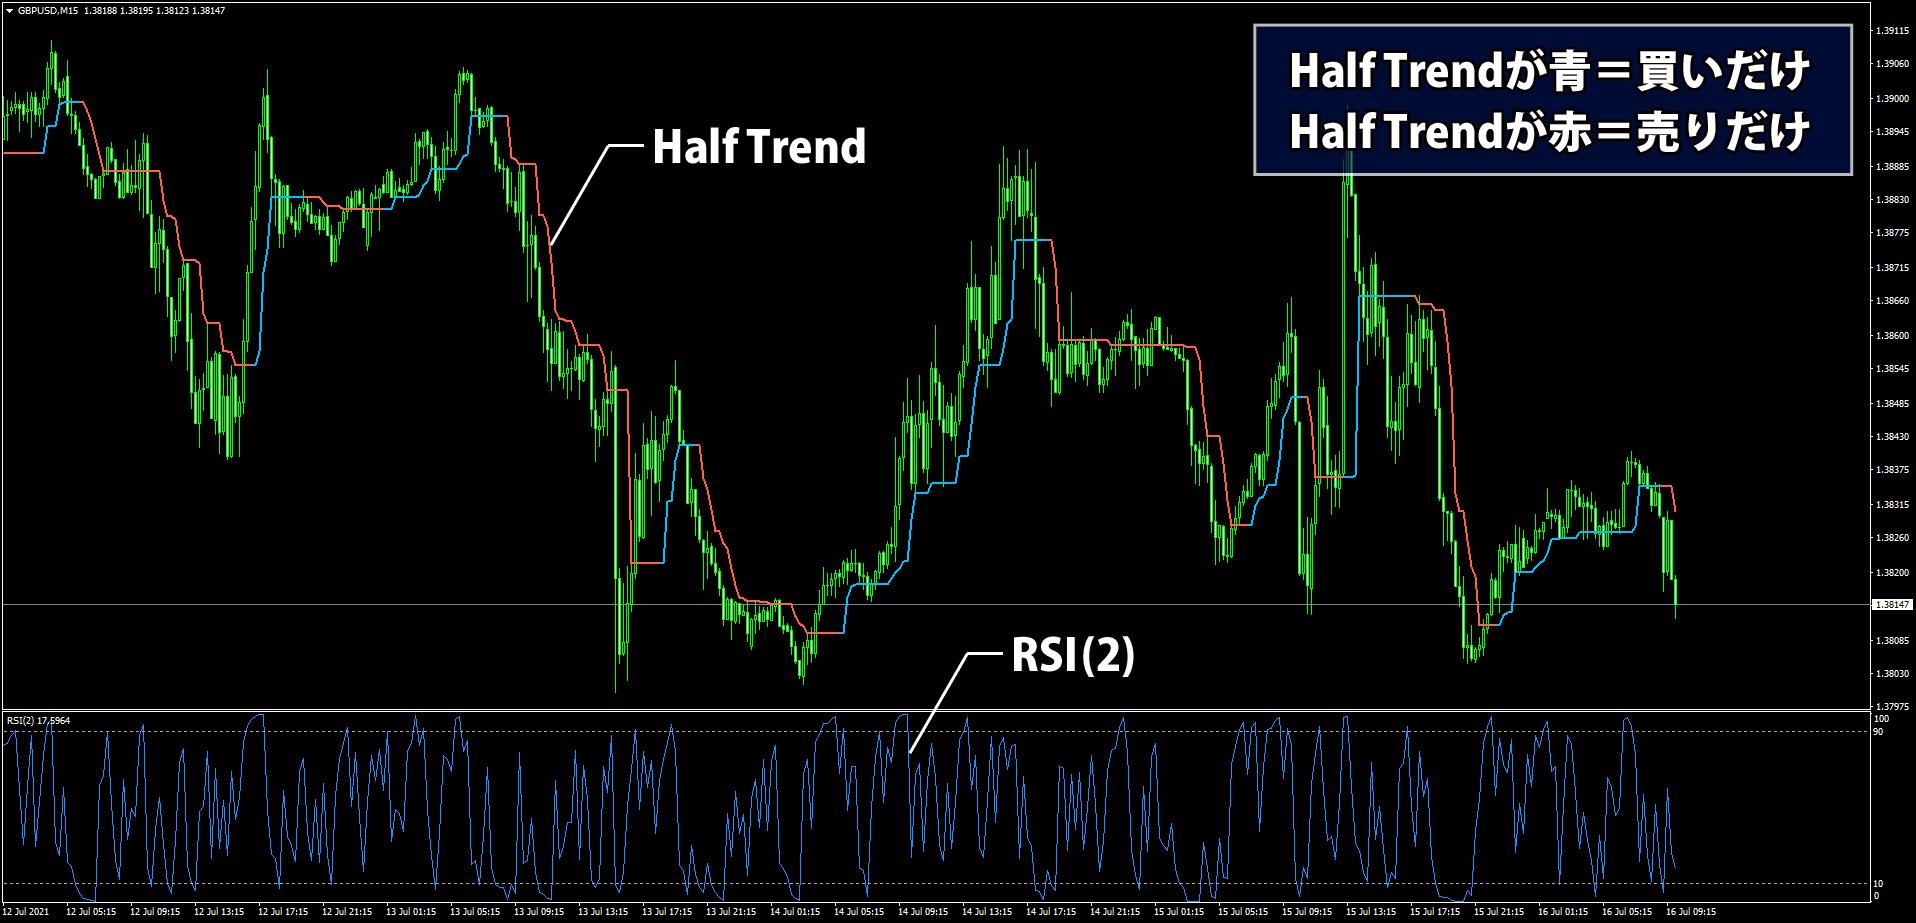 HalfTrendとRSIを使う高勝率トレード手法のチャート